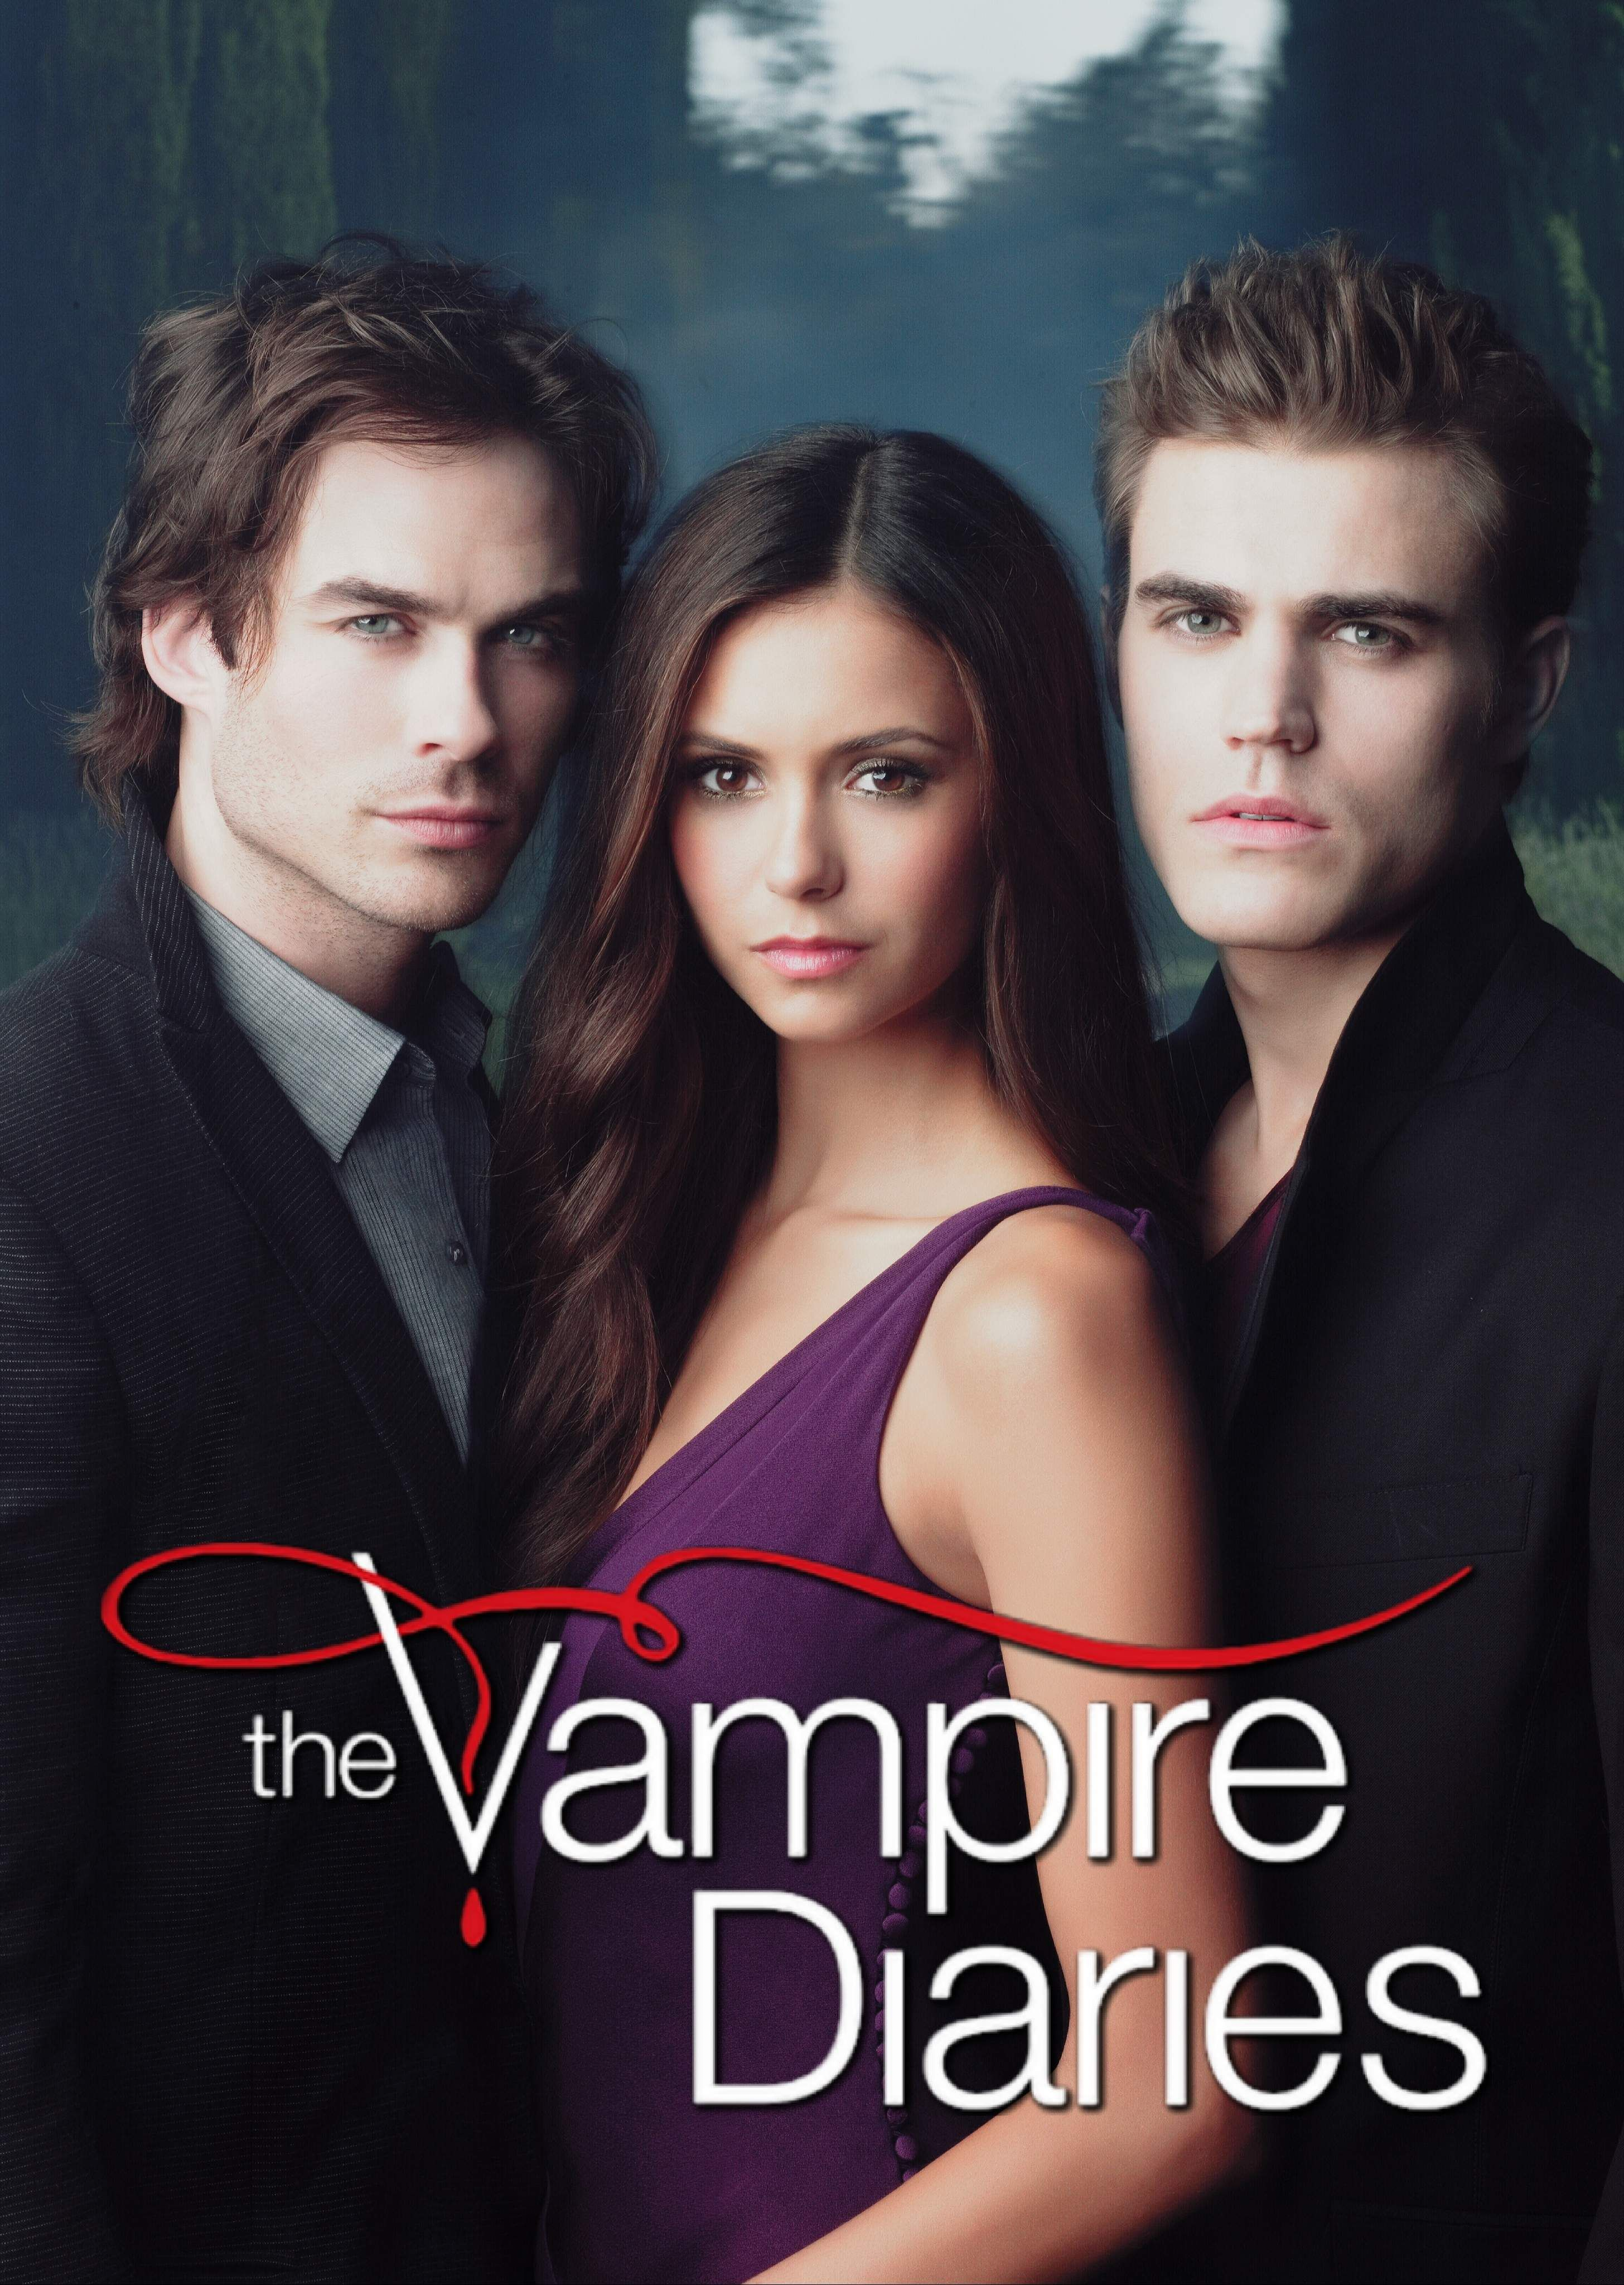 The Vampire Diaries مشاهدة وتحميل مسلسل